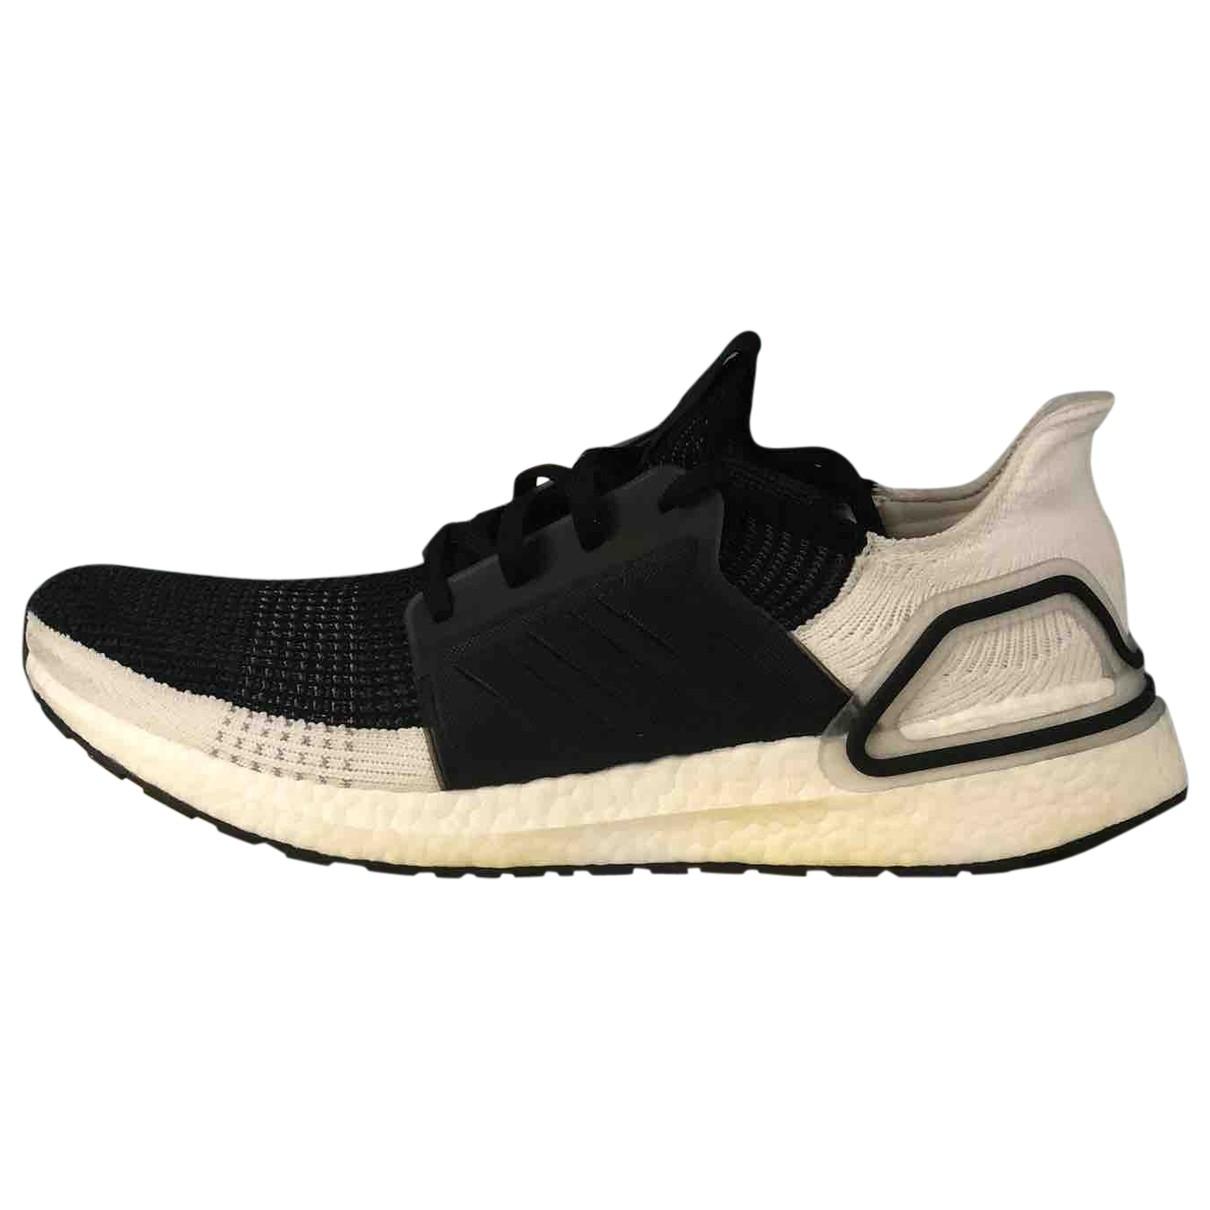 Adidas Ultraboost Sneakers in  Schwarz Leinen